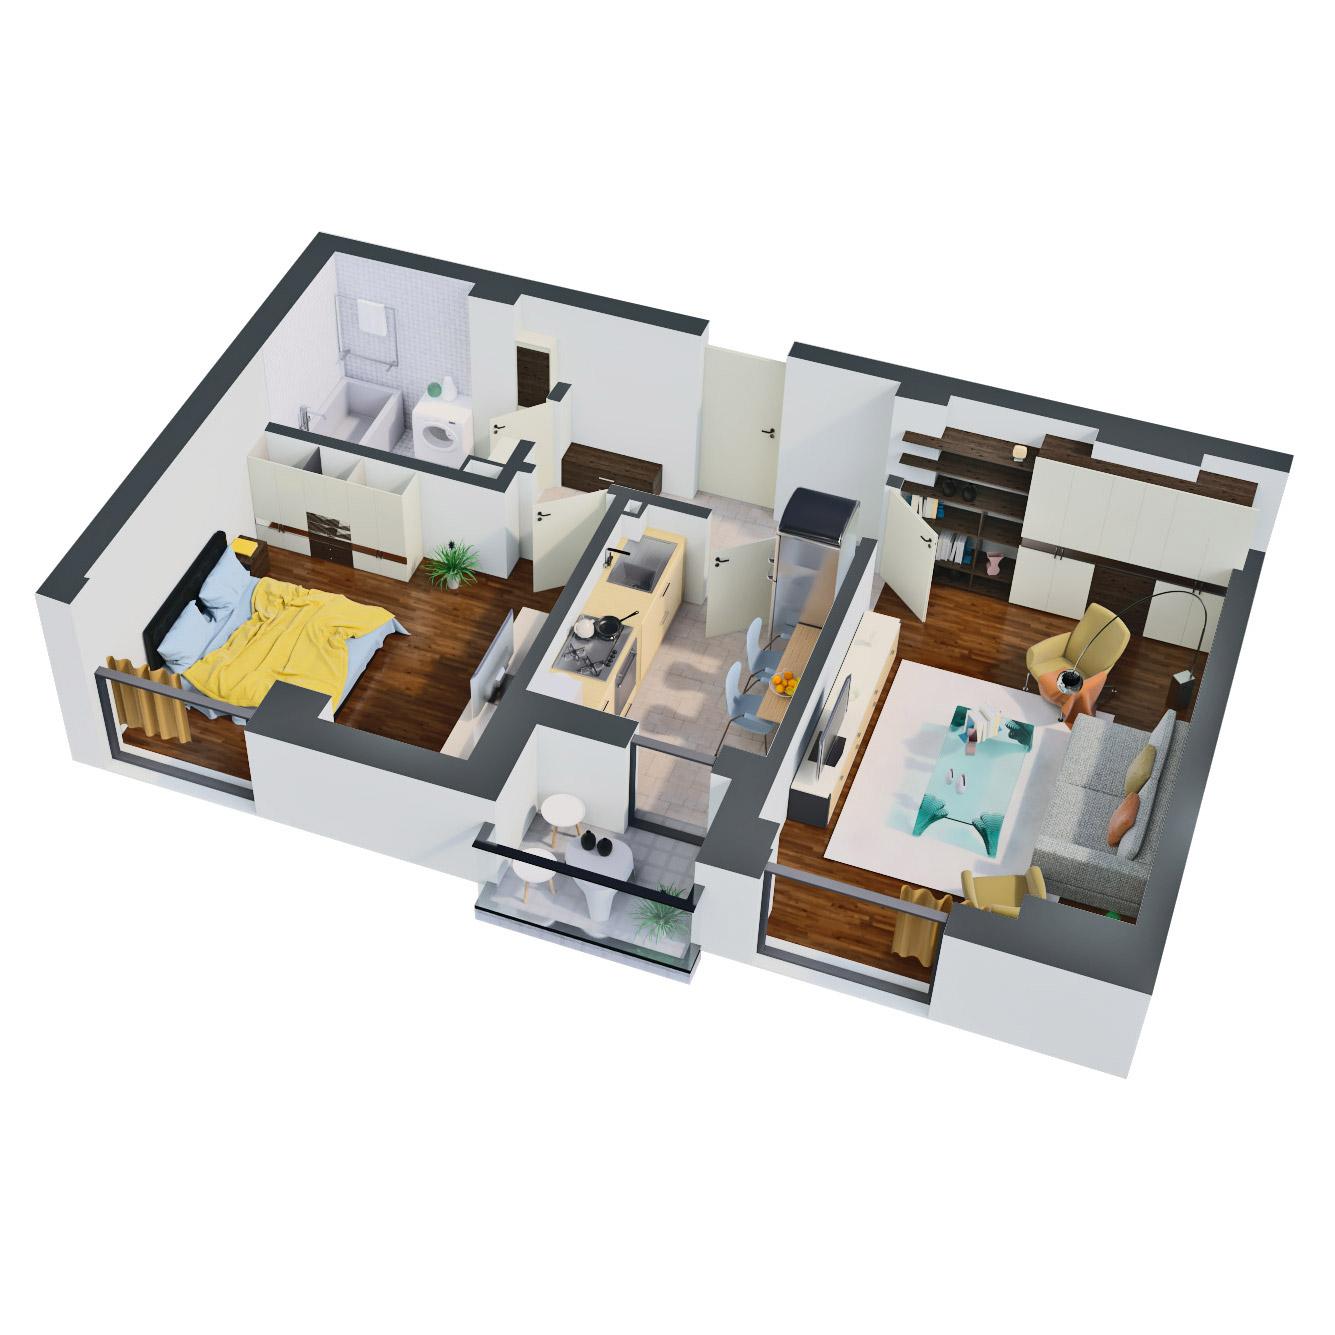 Apartament 2 camere de vanzare Bucuresti - Catedral Residence - Marriott, Piata Unirii, 13 Septembrie, Izvor - Tip 1 - T1 - B